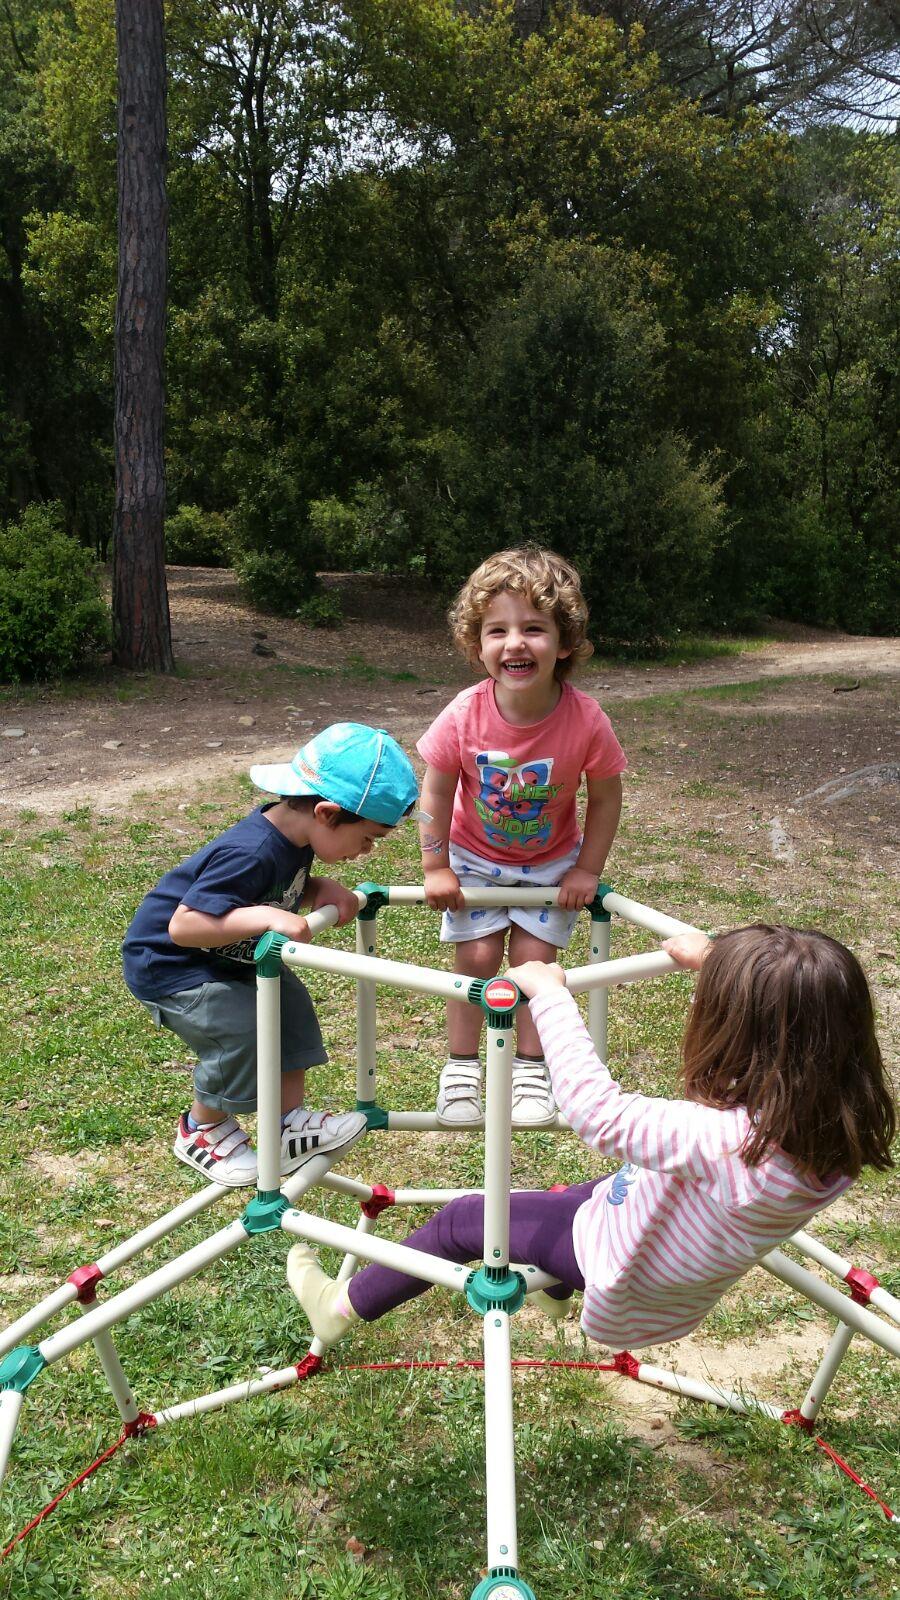 Lil monkey un centro de actividades para jugar al aire - Actividades para ninos al aire libre ...